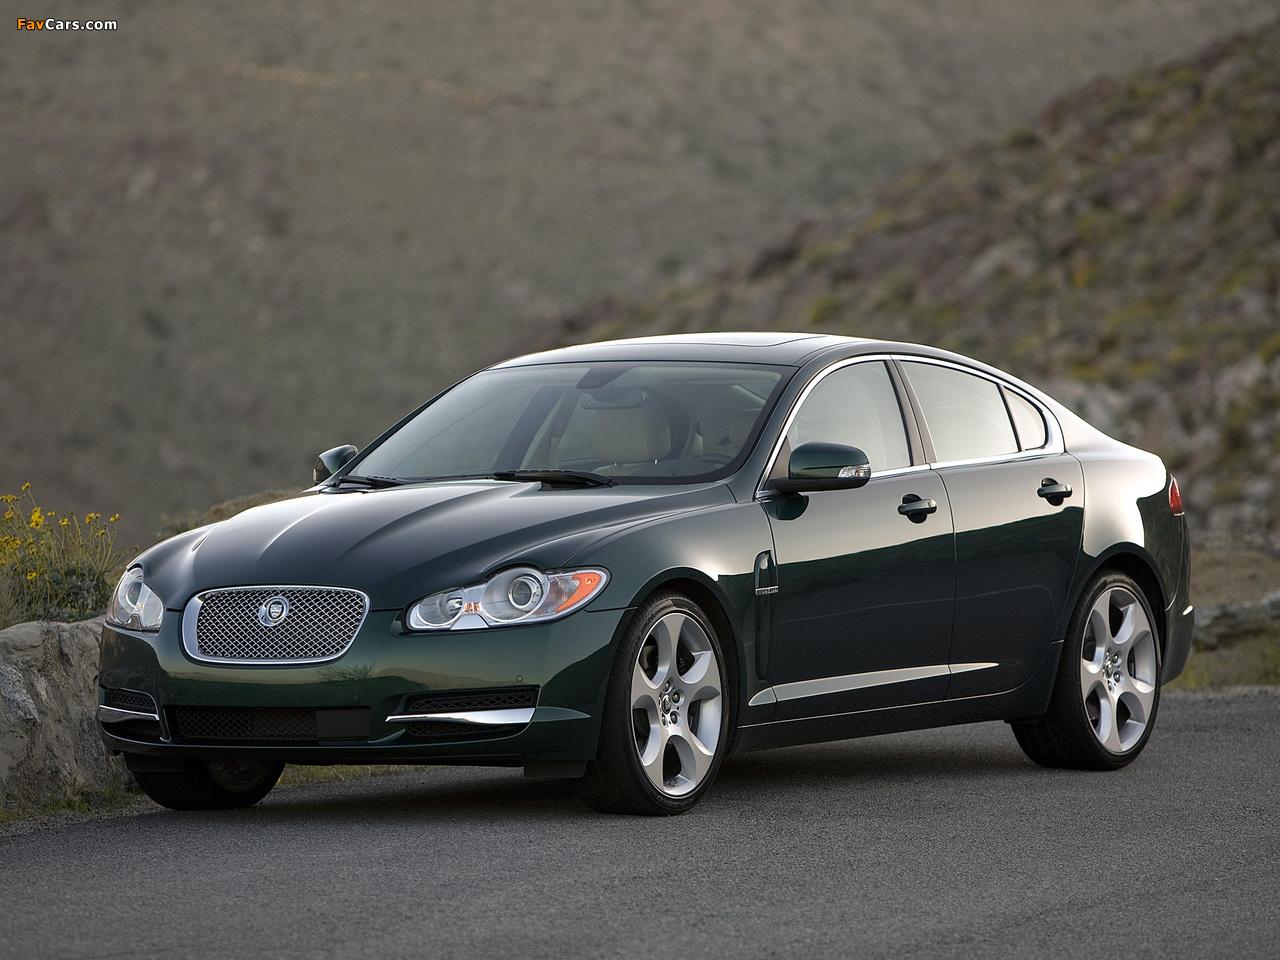 Photos of Jaguar XF US-spec 2008 (1280x960)